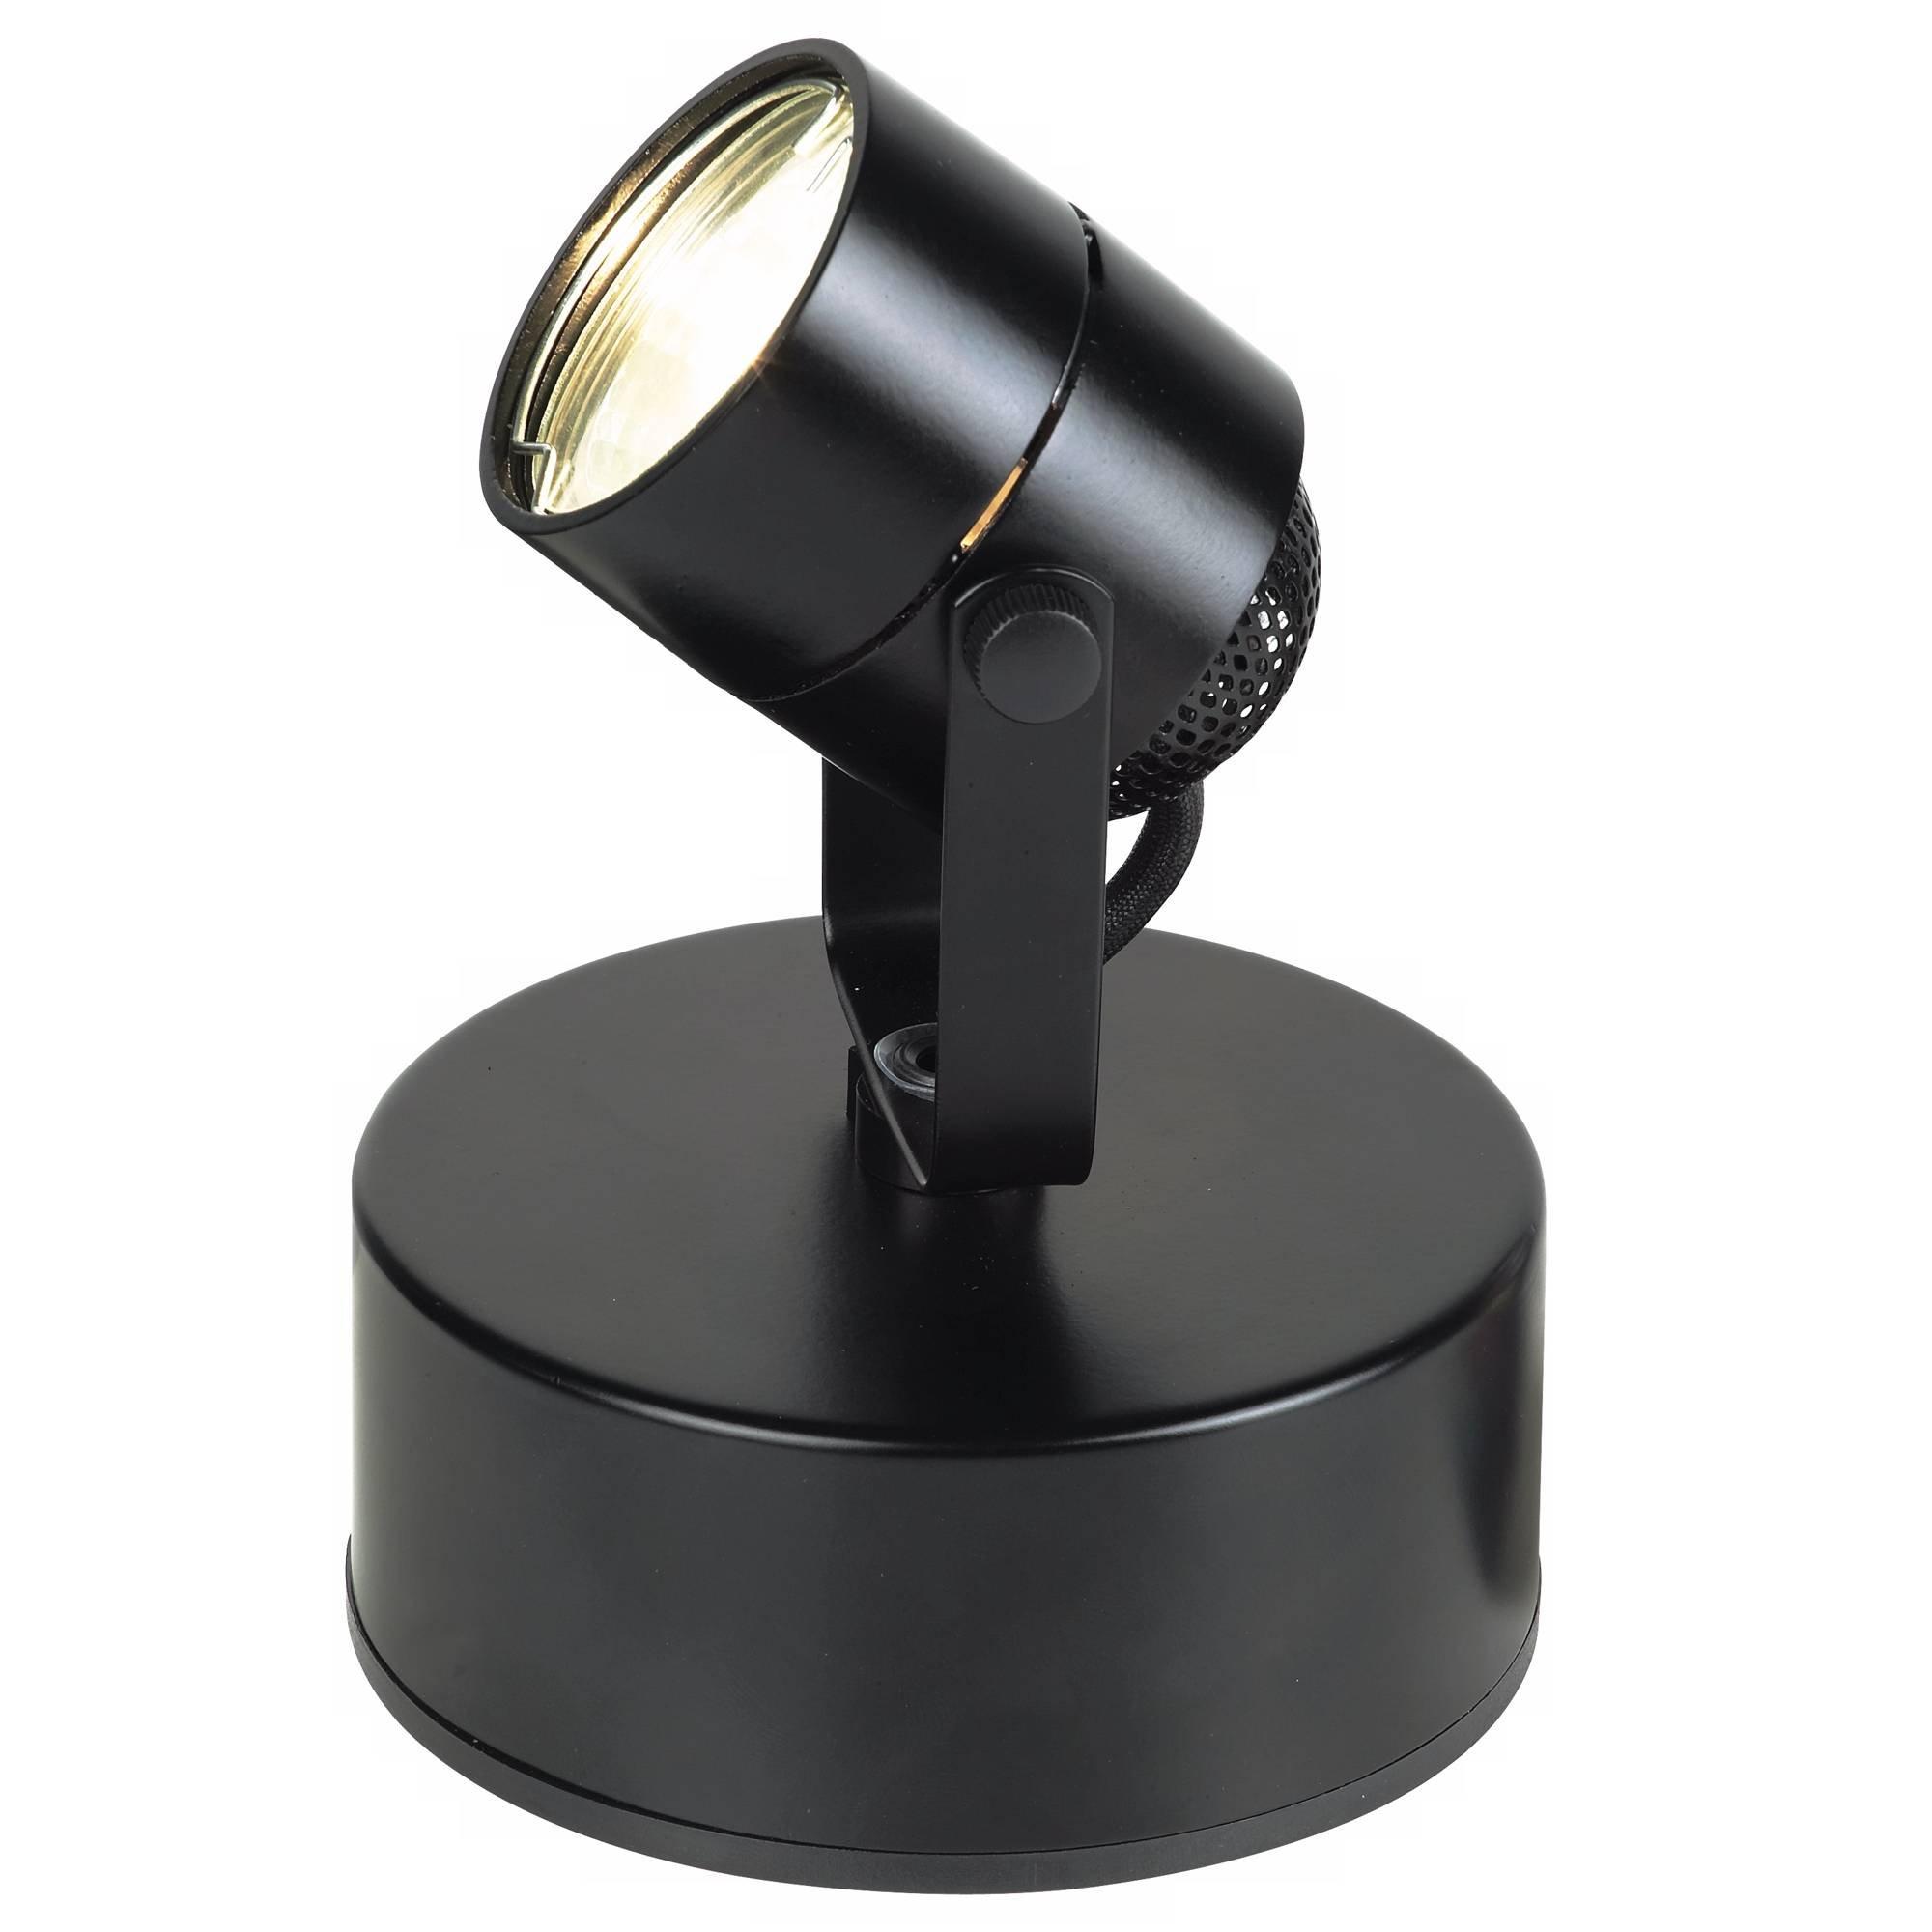 Mini Accent Uplight in Black with Halogen Bulb - Pro Track